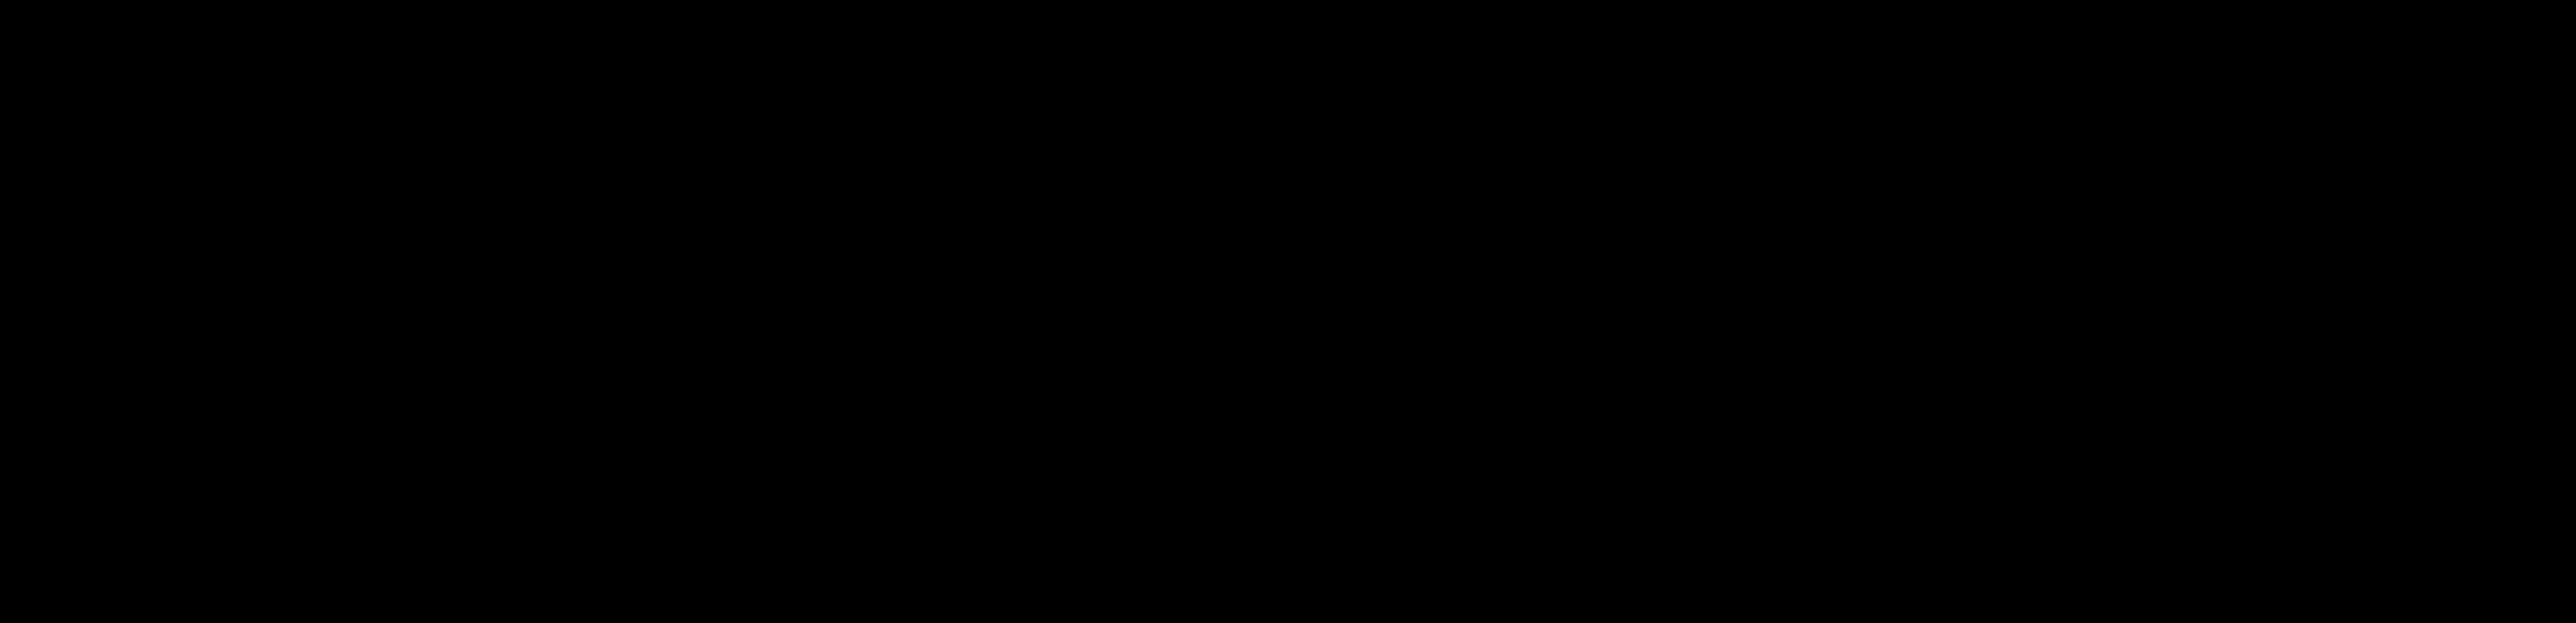 File:Ammunition LLC logo.png - Wikimedia Commons